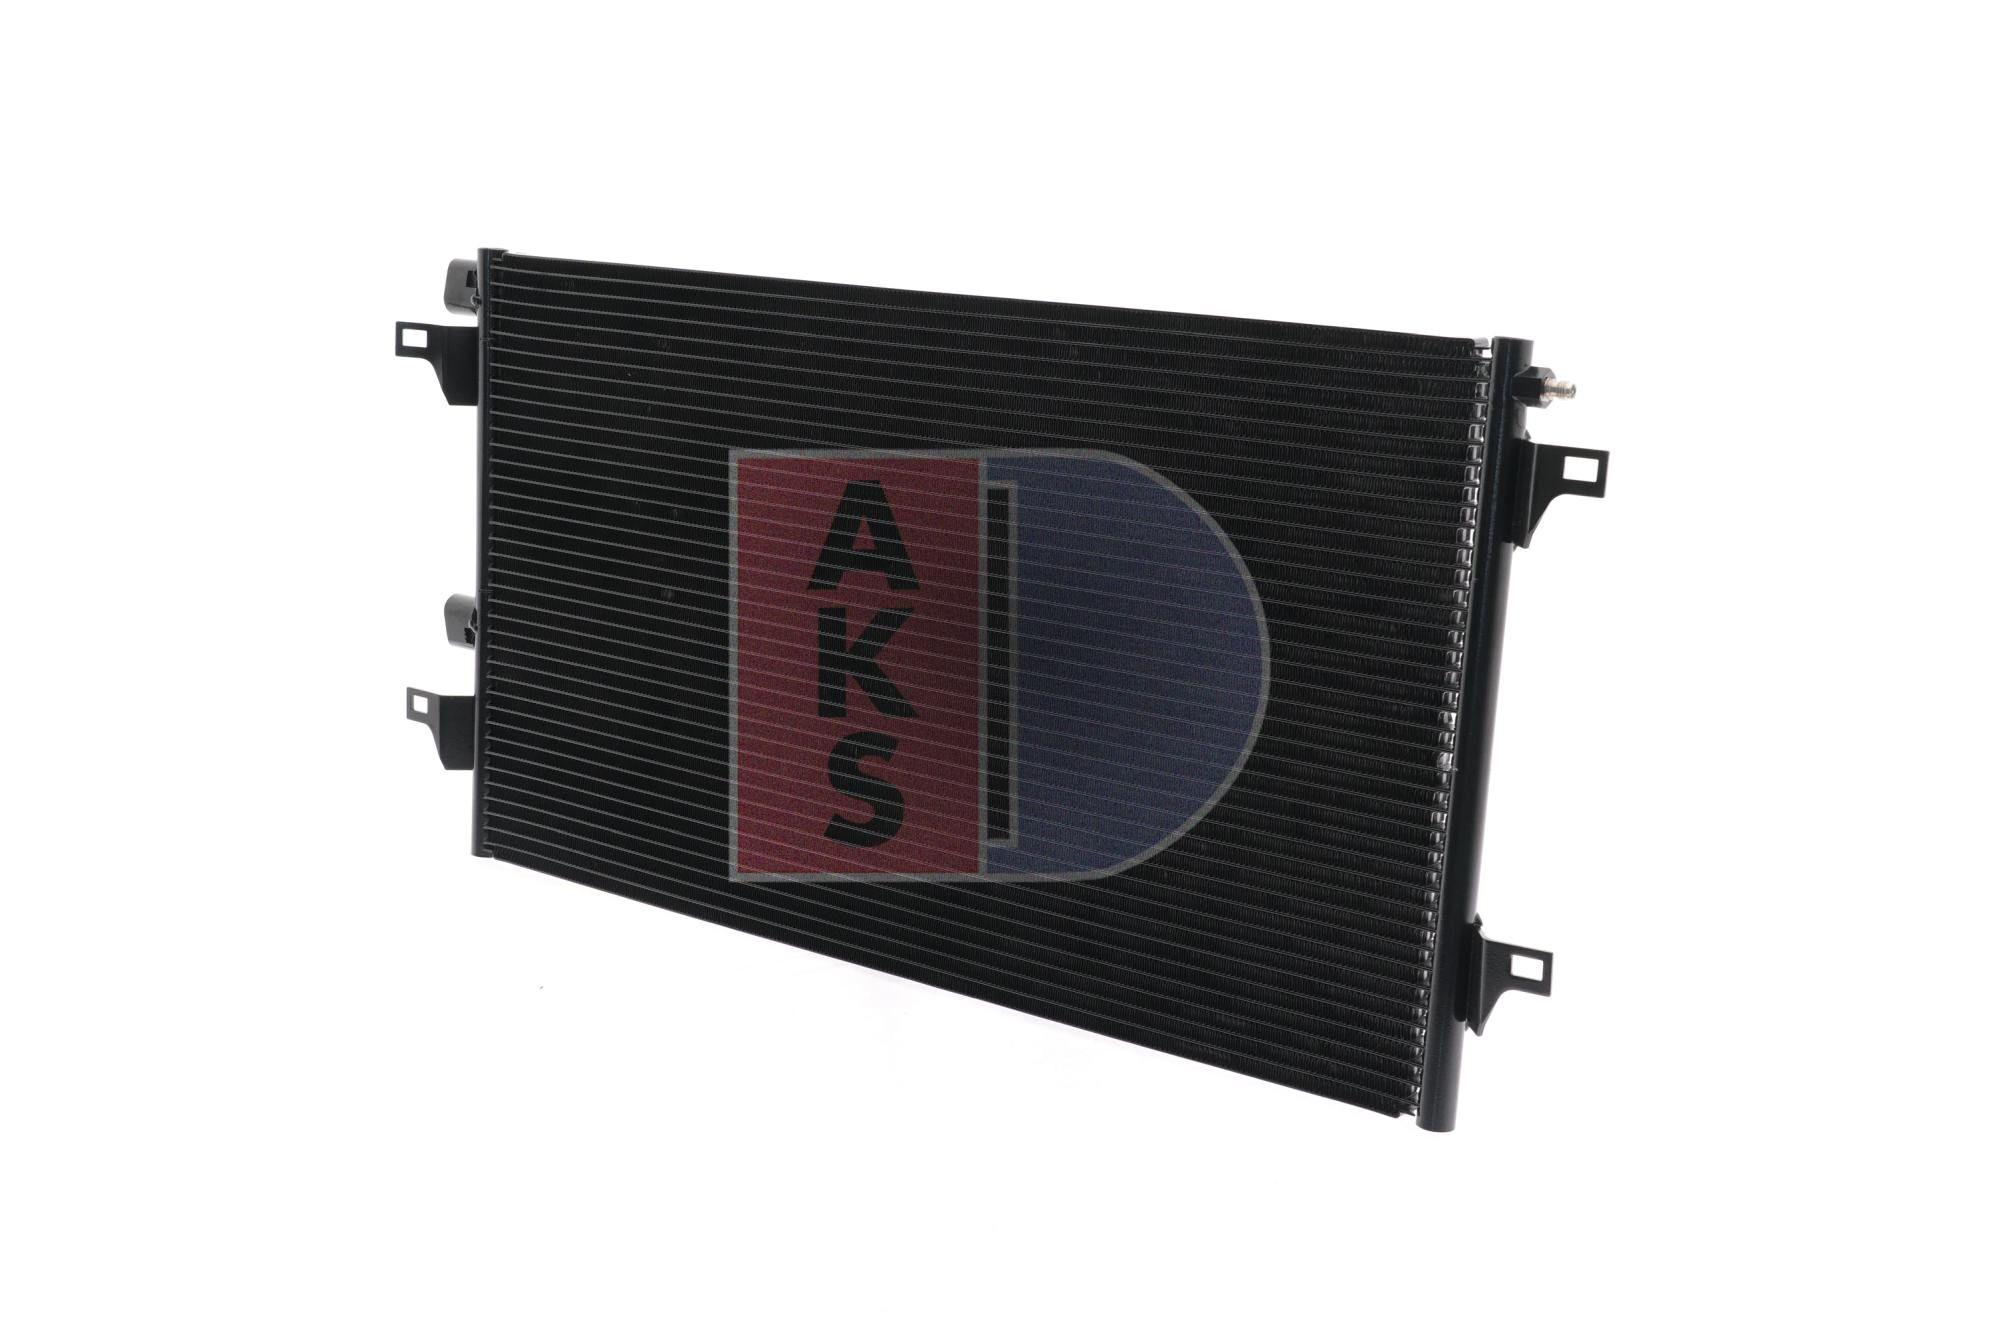 RENAULT VEL SATIS 2017 Klimakühler - Original AKS DASIS 182031N Netzmaße: 660x392x16